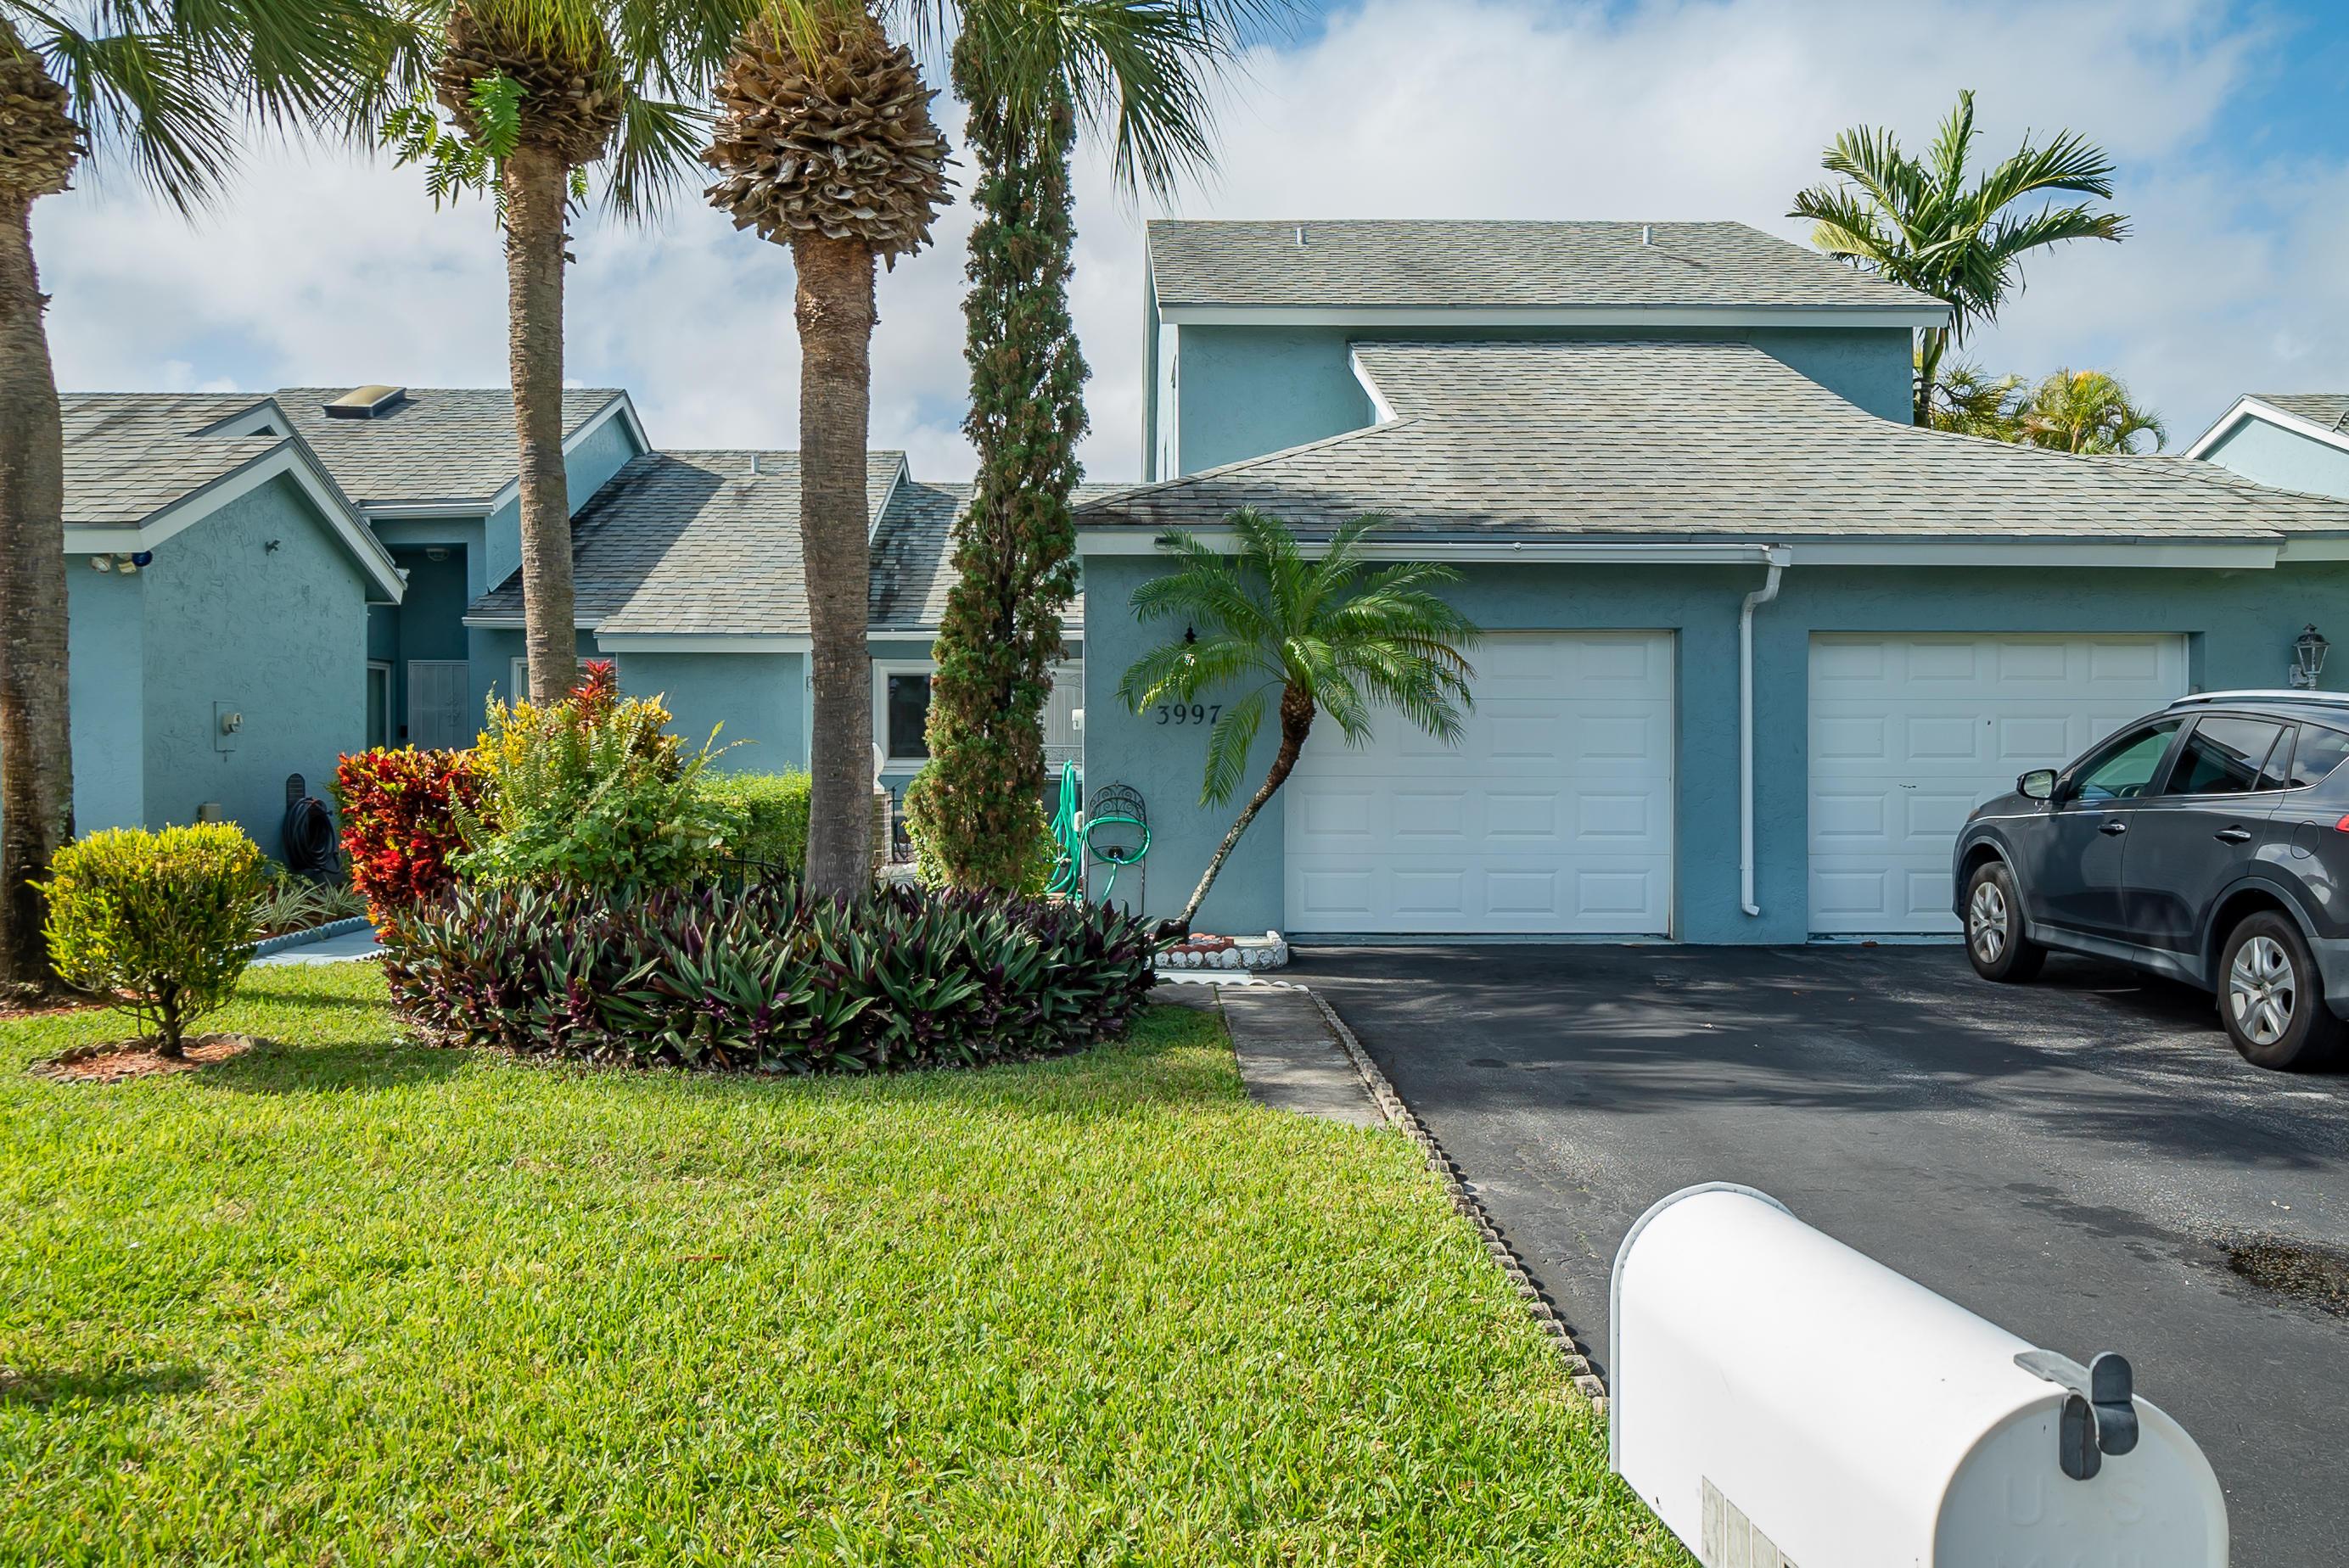 3997 Island Club Drive Lake Worth, FL 33462